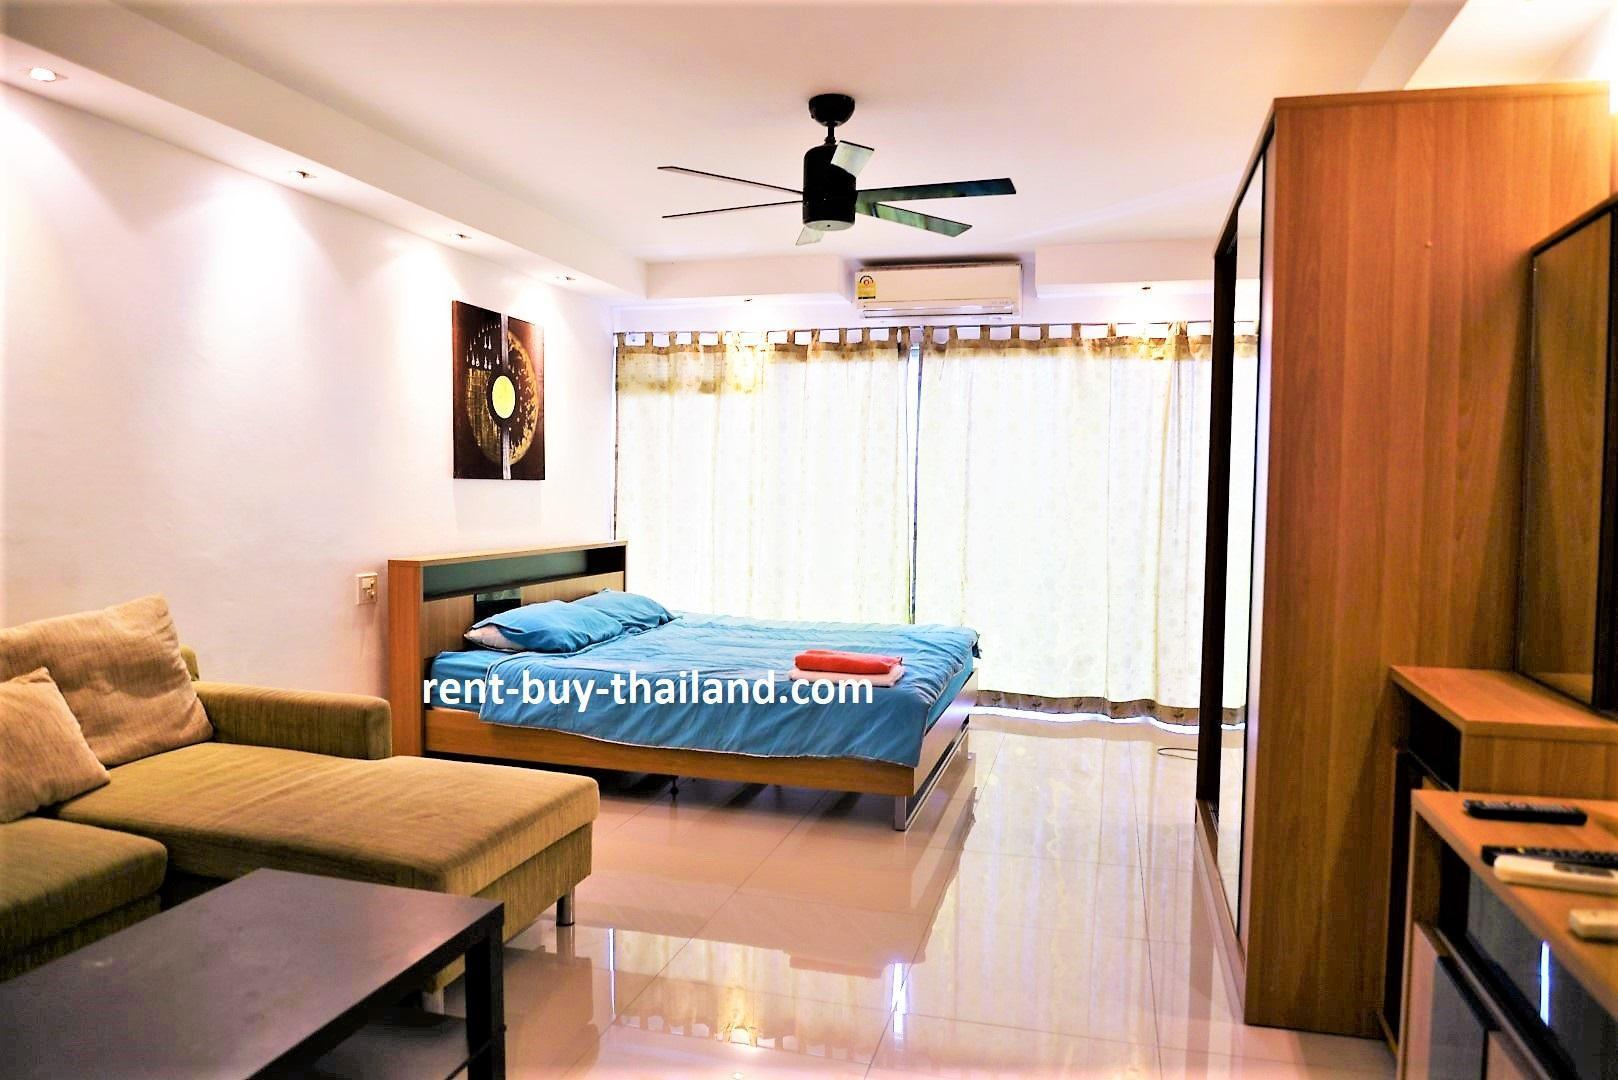 Pattaya Plaza condo shopping, restaurants & bars สตูดิโอ อพาร์ตเมนต์ 1 ห้องน้ำส่วนตัว ขนาด 40 ตร.ม. – พัทยากลาง